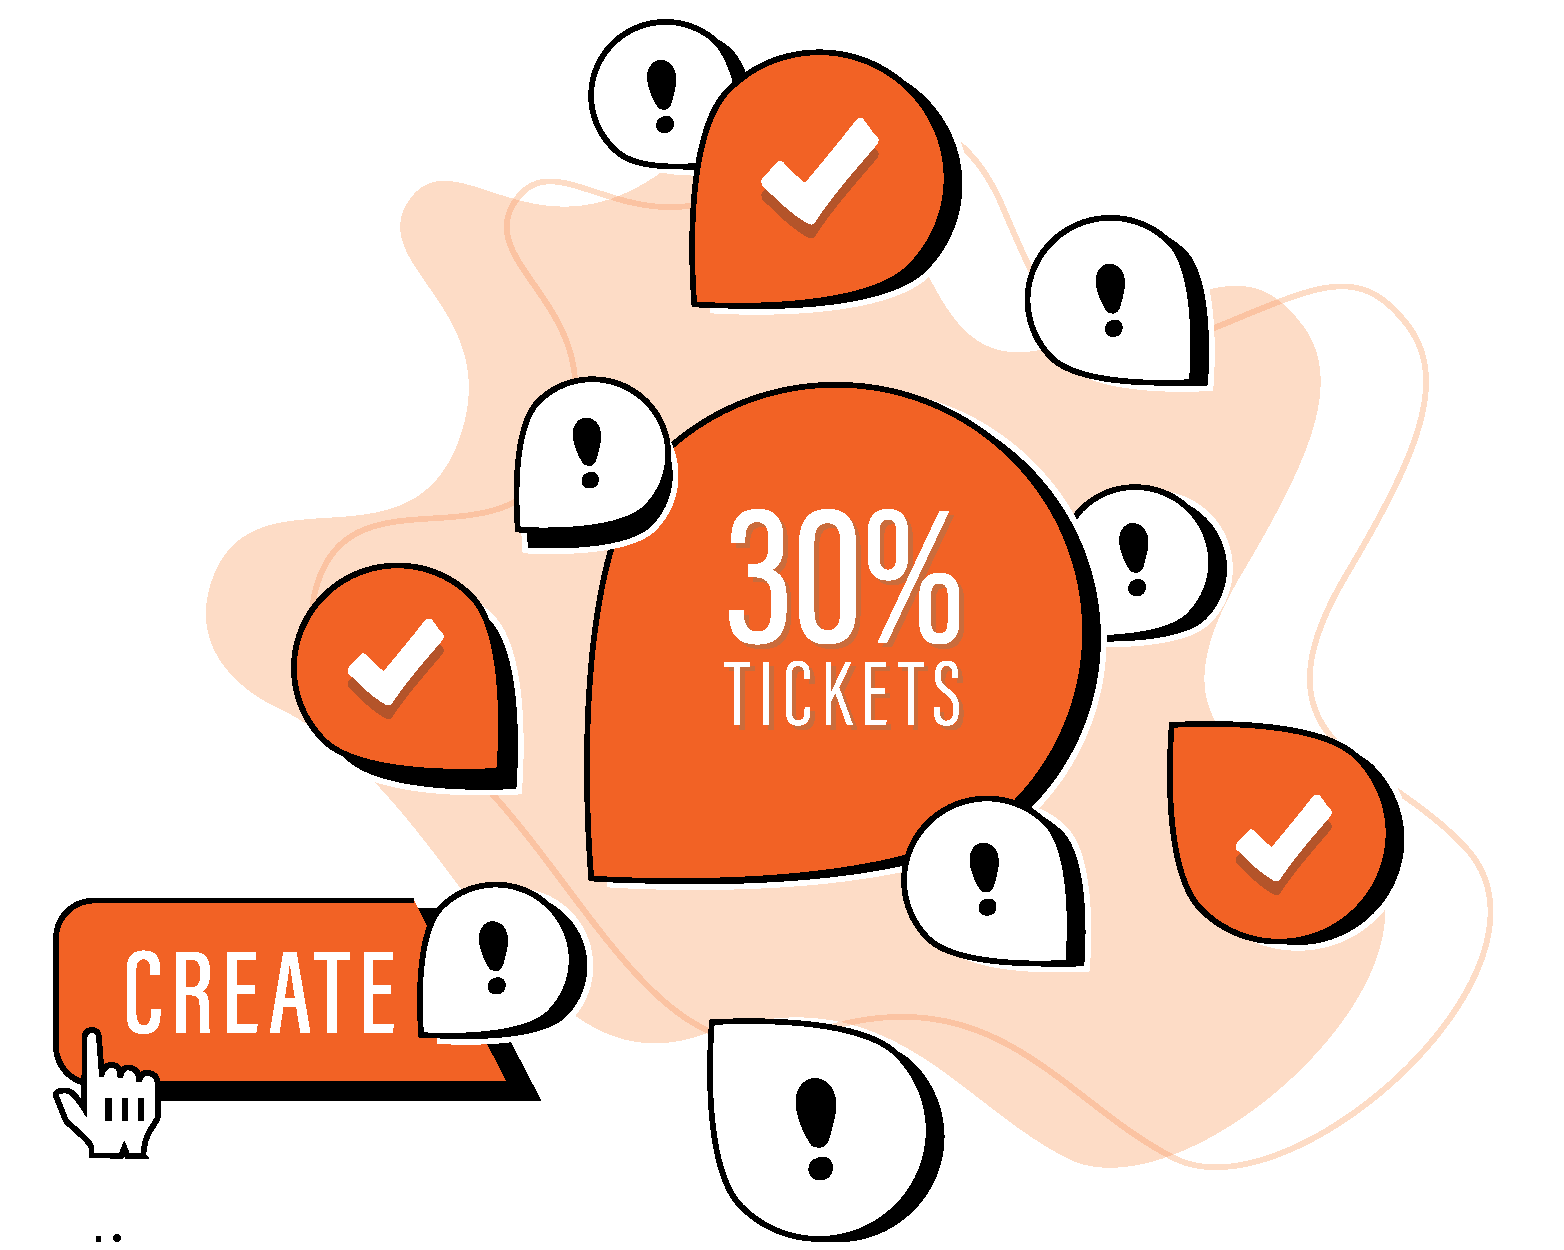 Create 30% tickets graphic